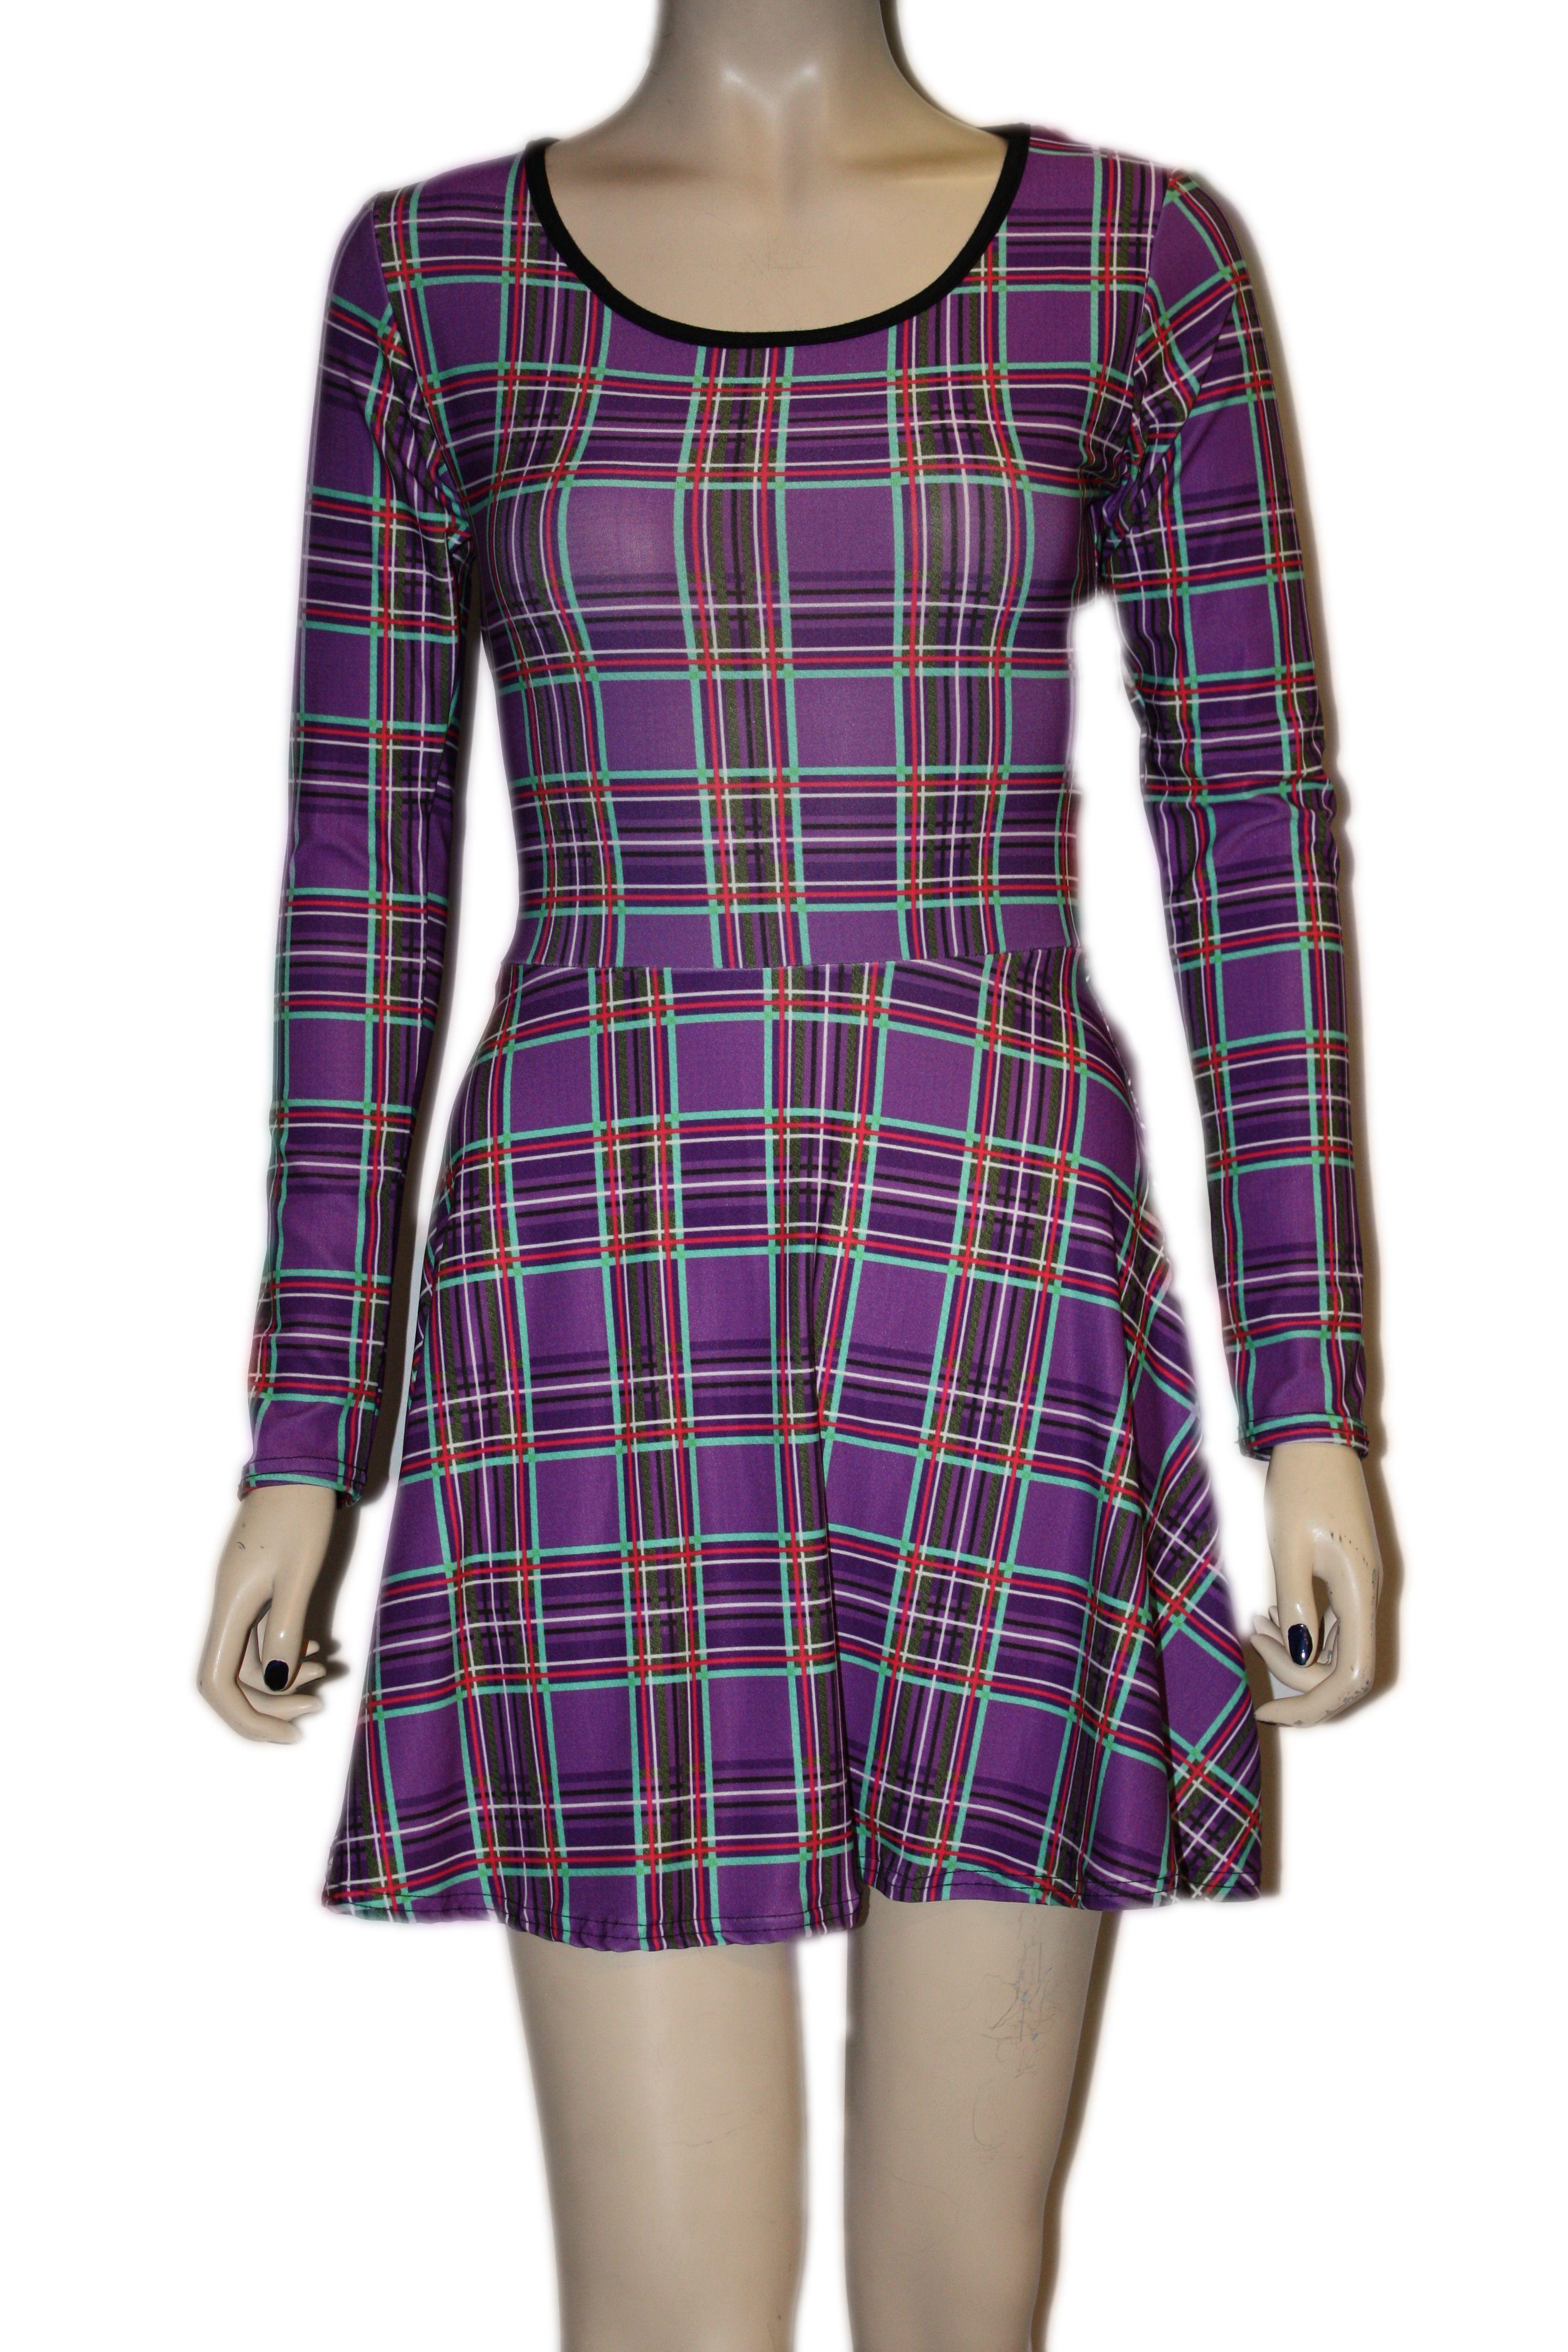 c7ff2abbbf0a Purple Tartan printed designer long sleeves Skater Dress ...